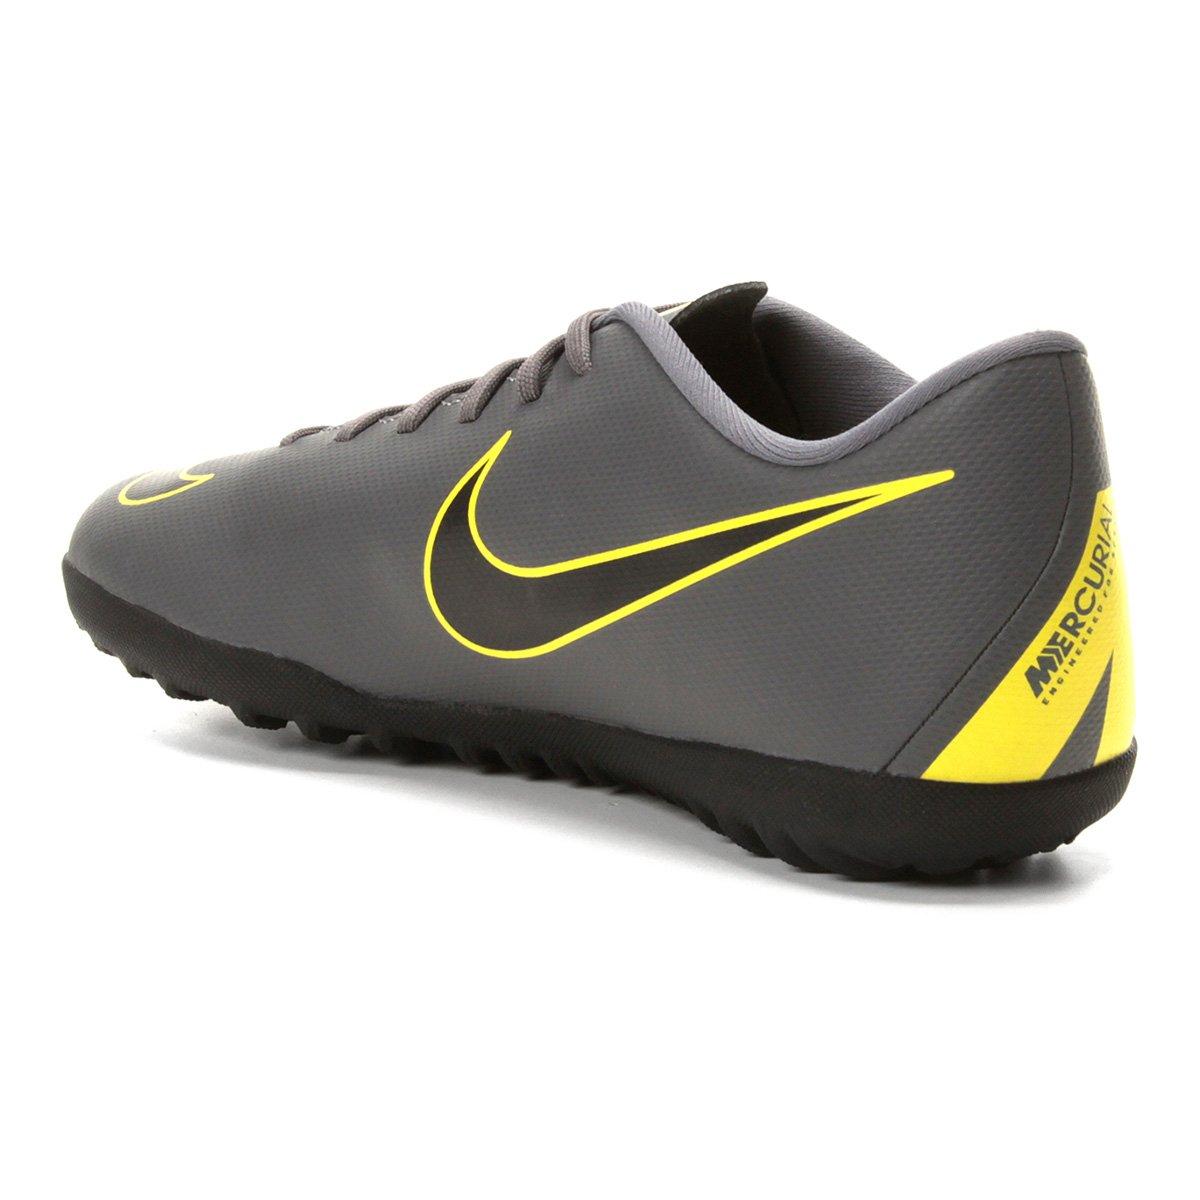 Chuteira Society Nike Vapor 12 Club TF - Cinza e Amarelo - Compre ... a3f19b48b3ff6